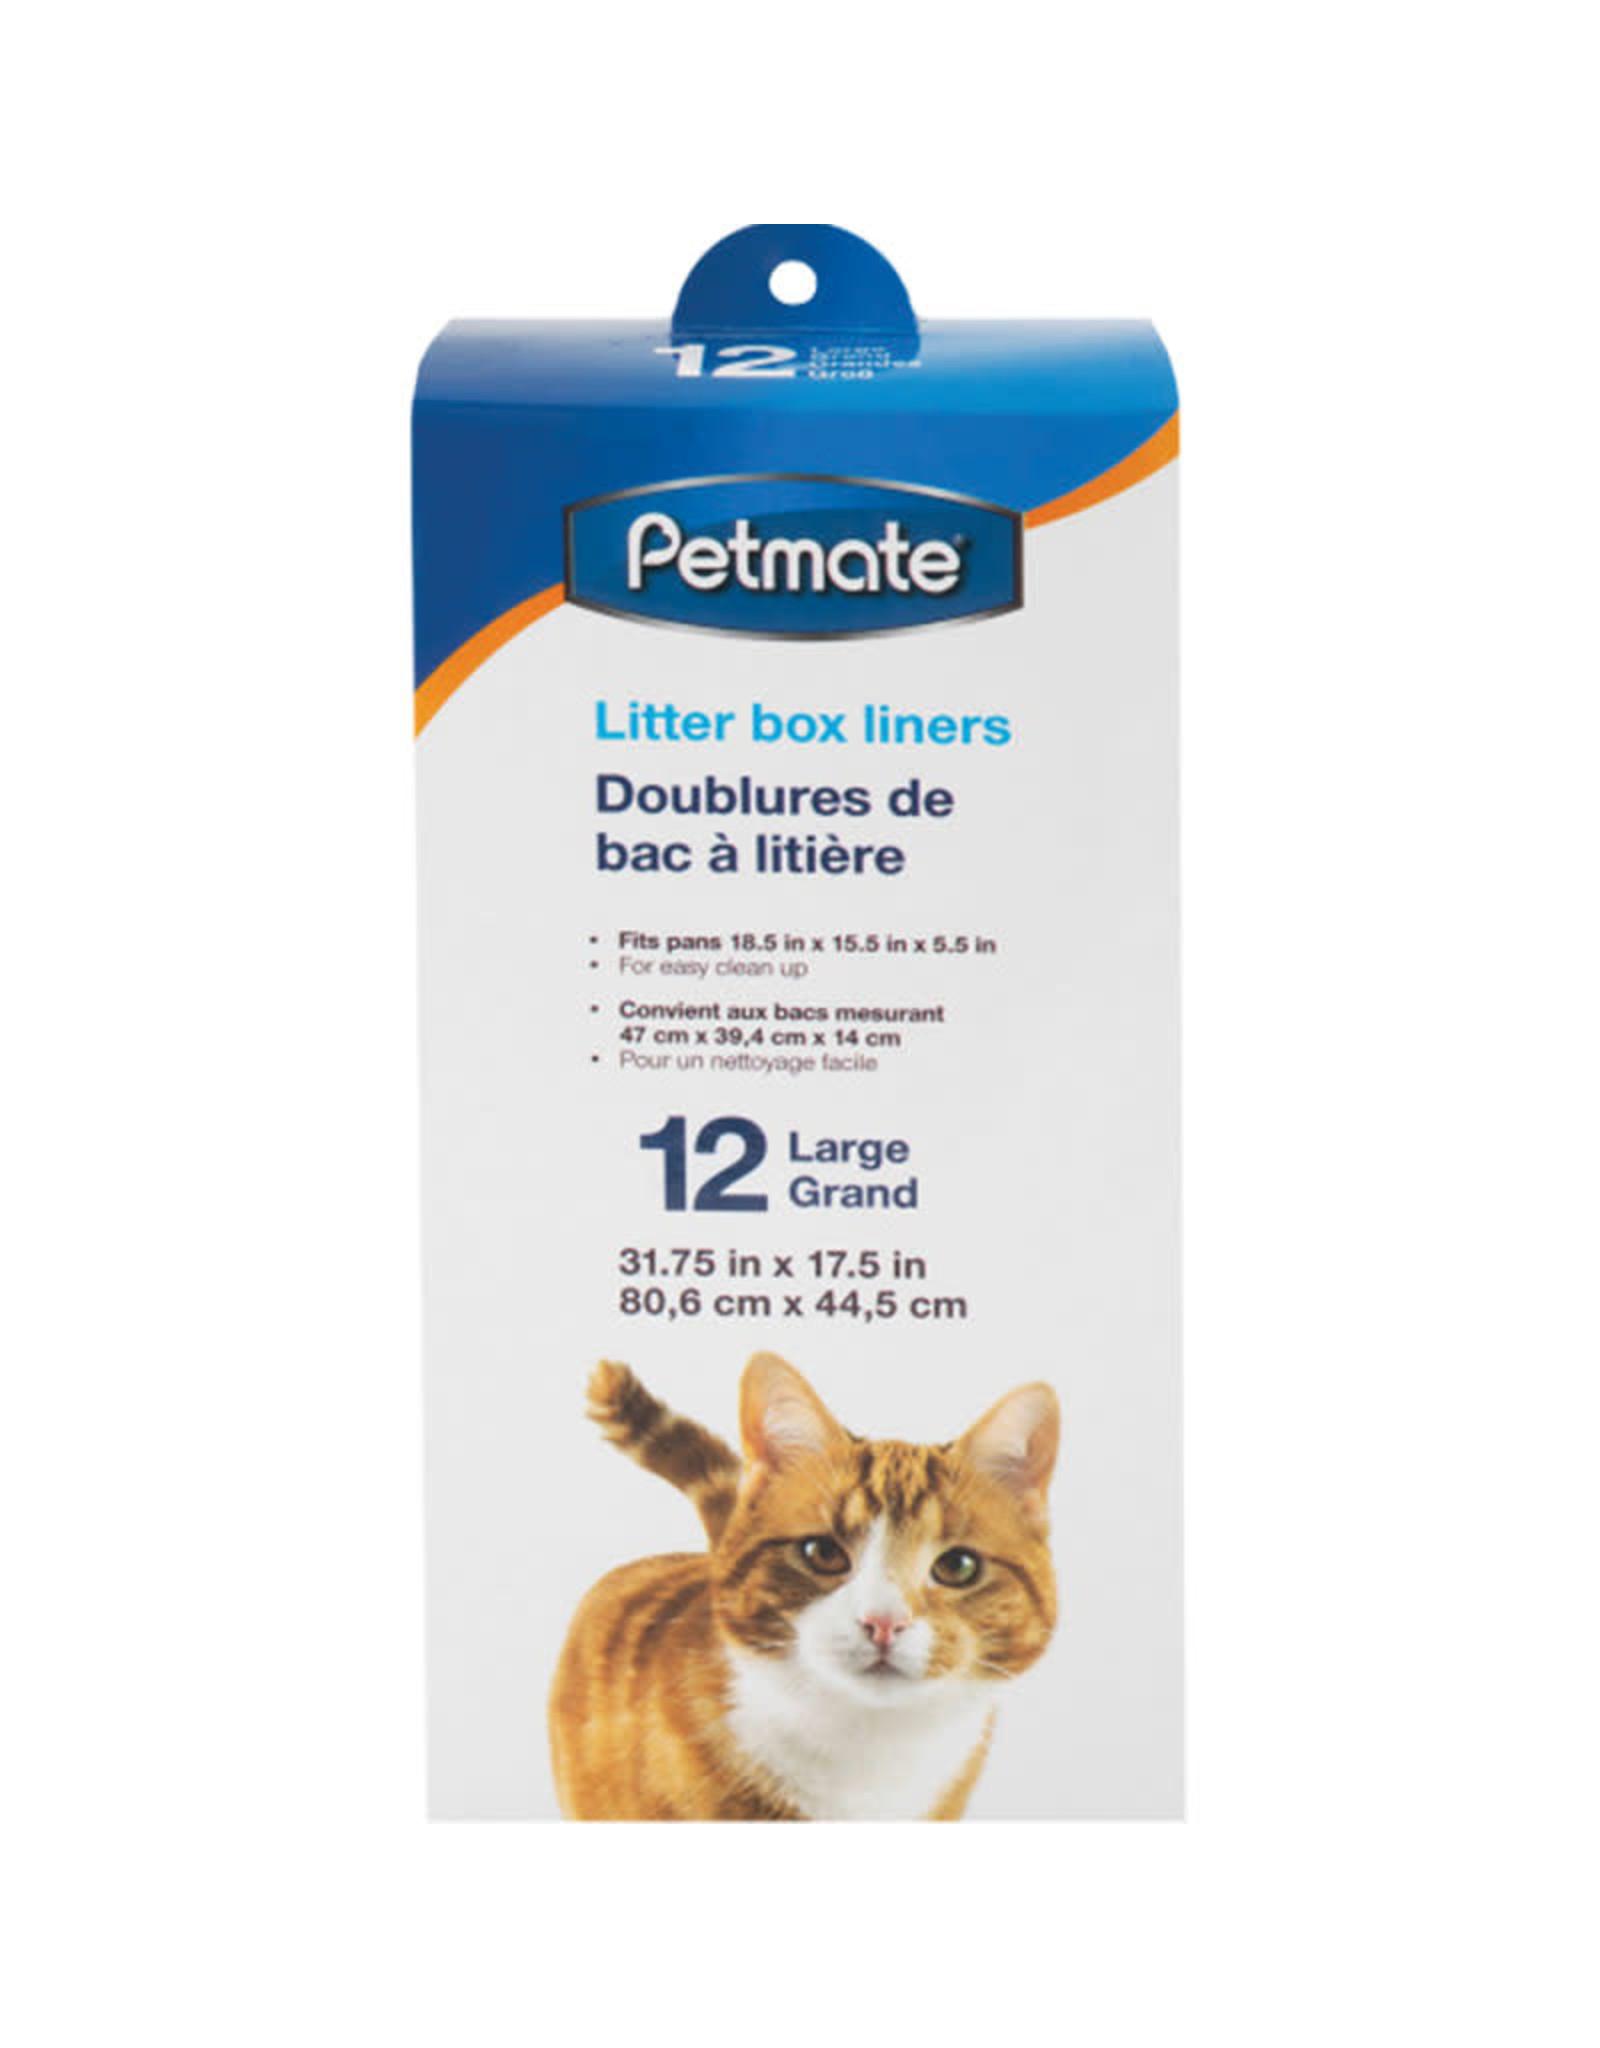 Petmate Petmate Cat Litter Pan Liners 12pk - Large